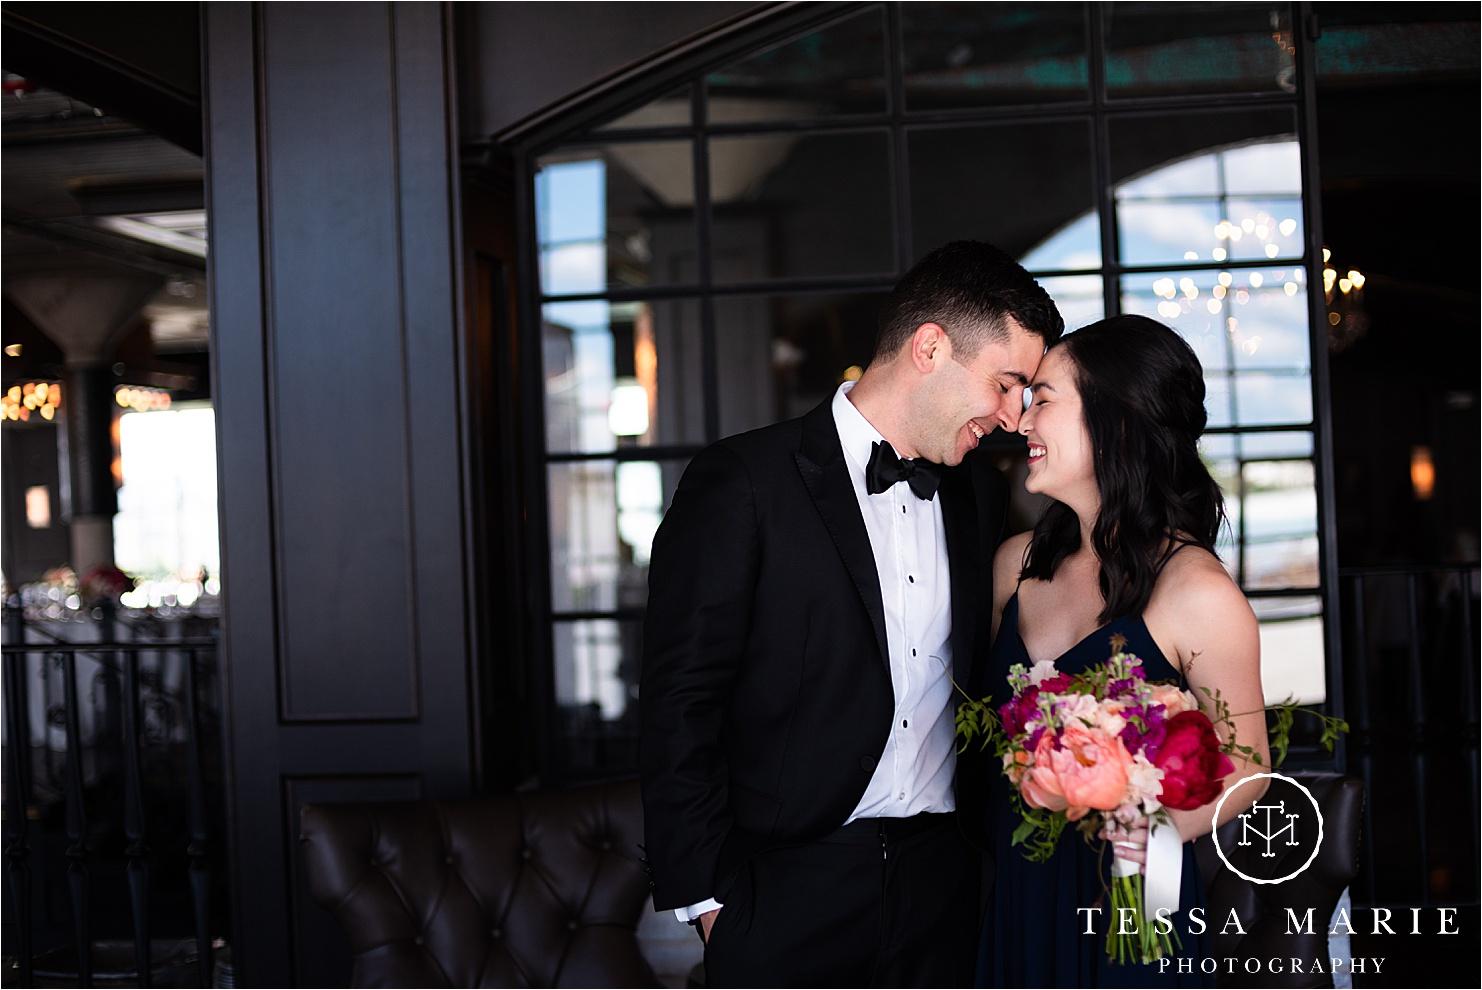 Tessa_marie_weddings_houston_wedding_photographer_The_astorian_0096.jpg